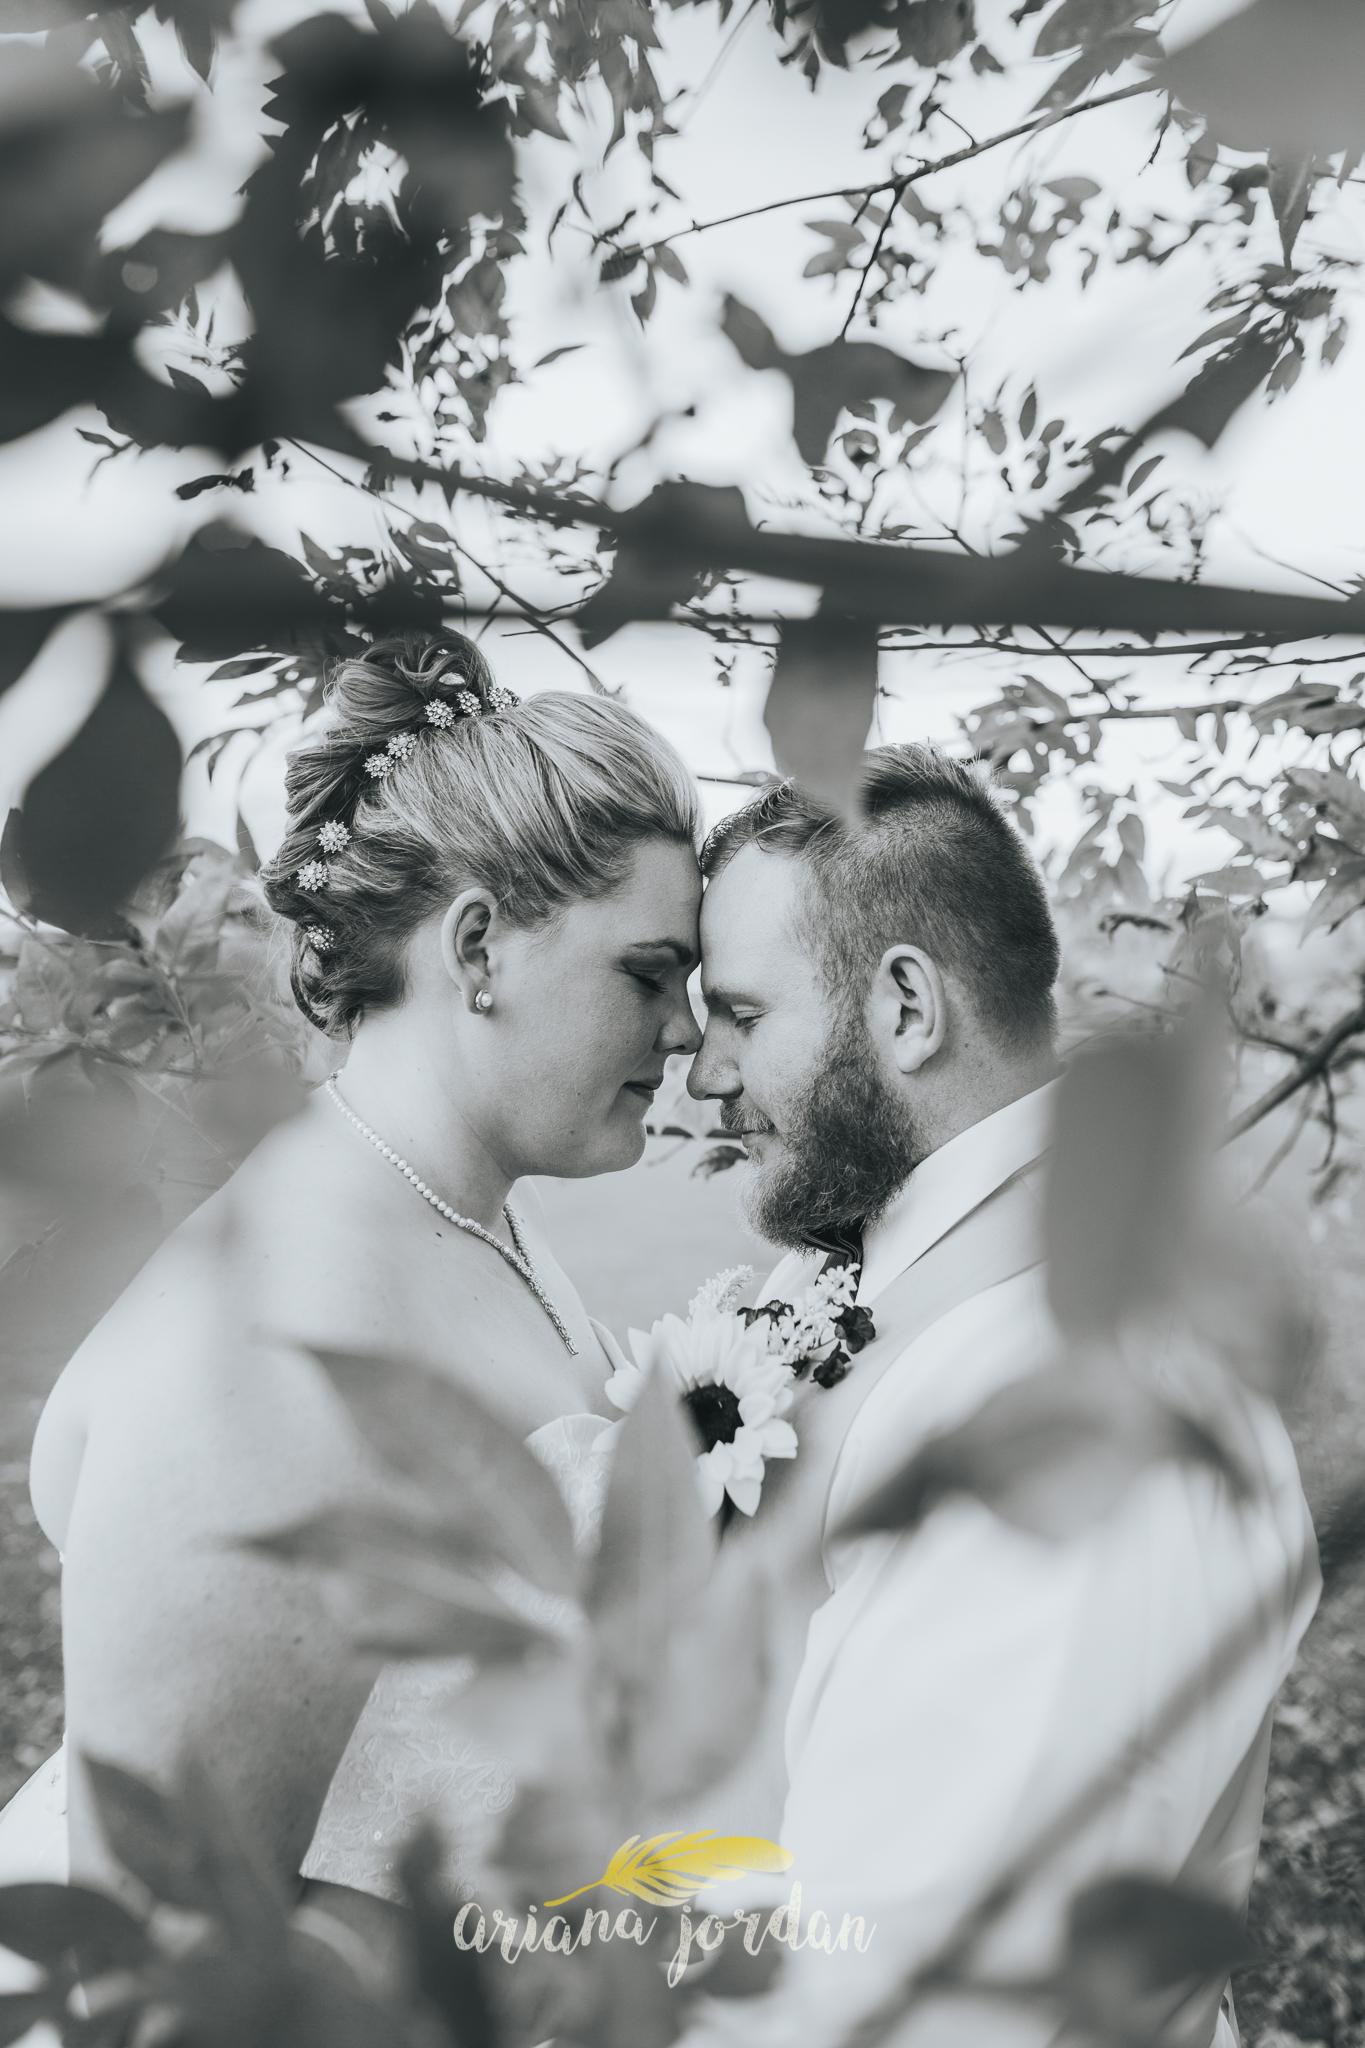 0086 Ariana Jordan Photography - Georgetown KY Wedding Photographer 8807.jpg